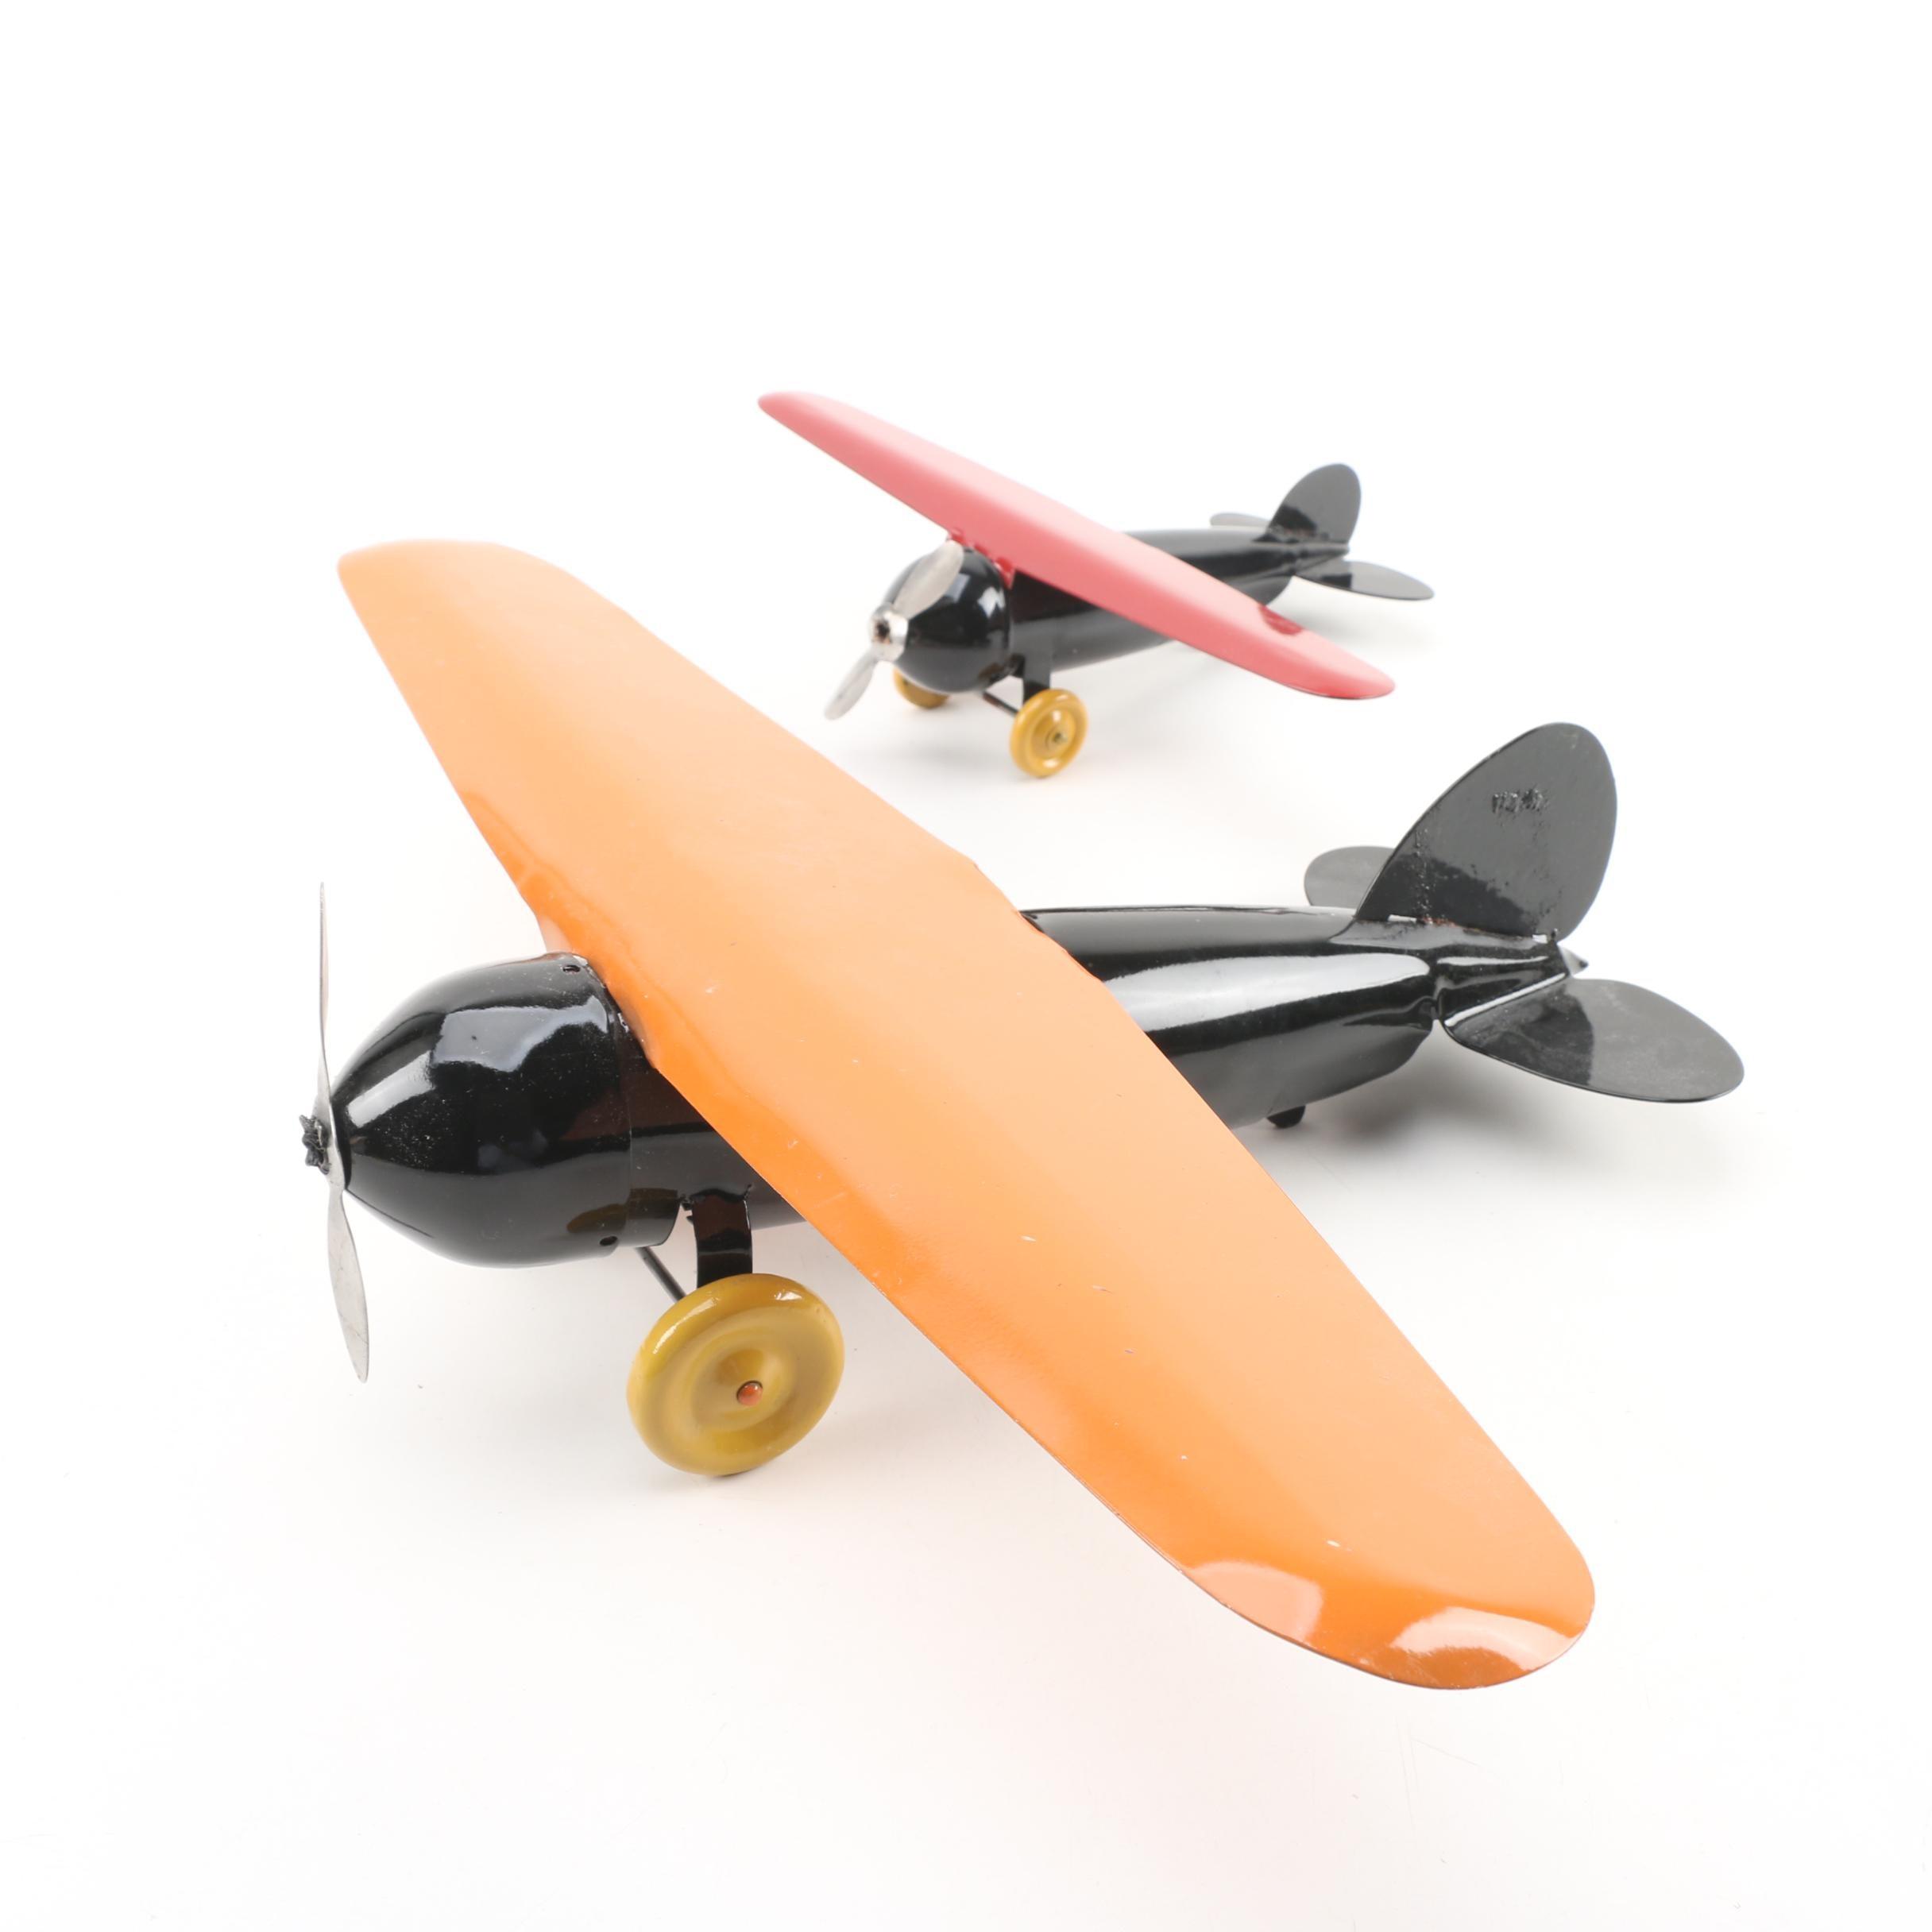 Two Toy Metal Airplanes, Vintage